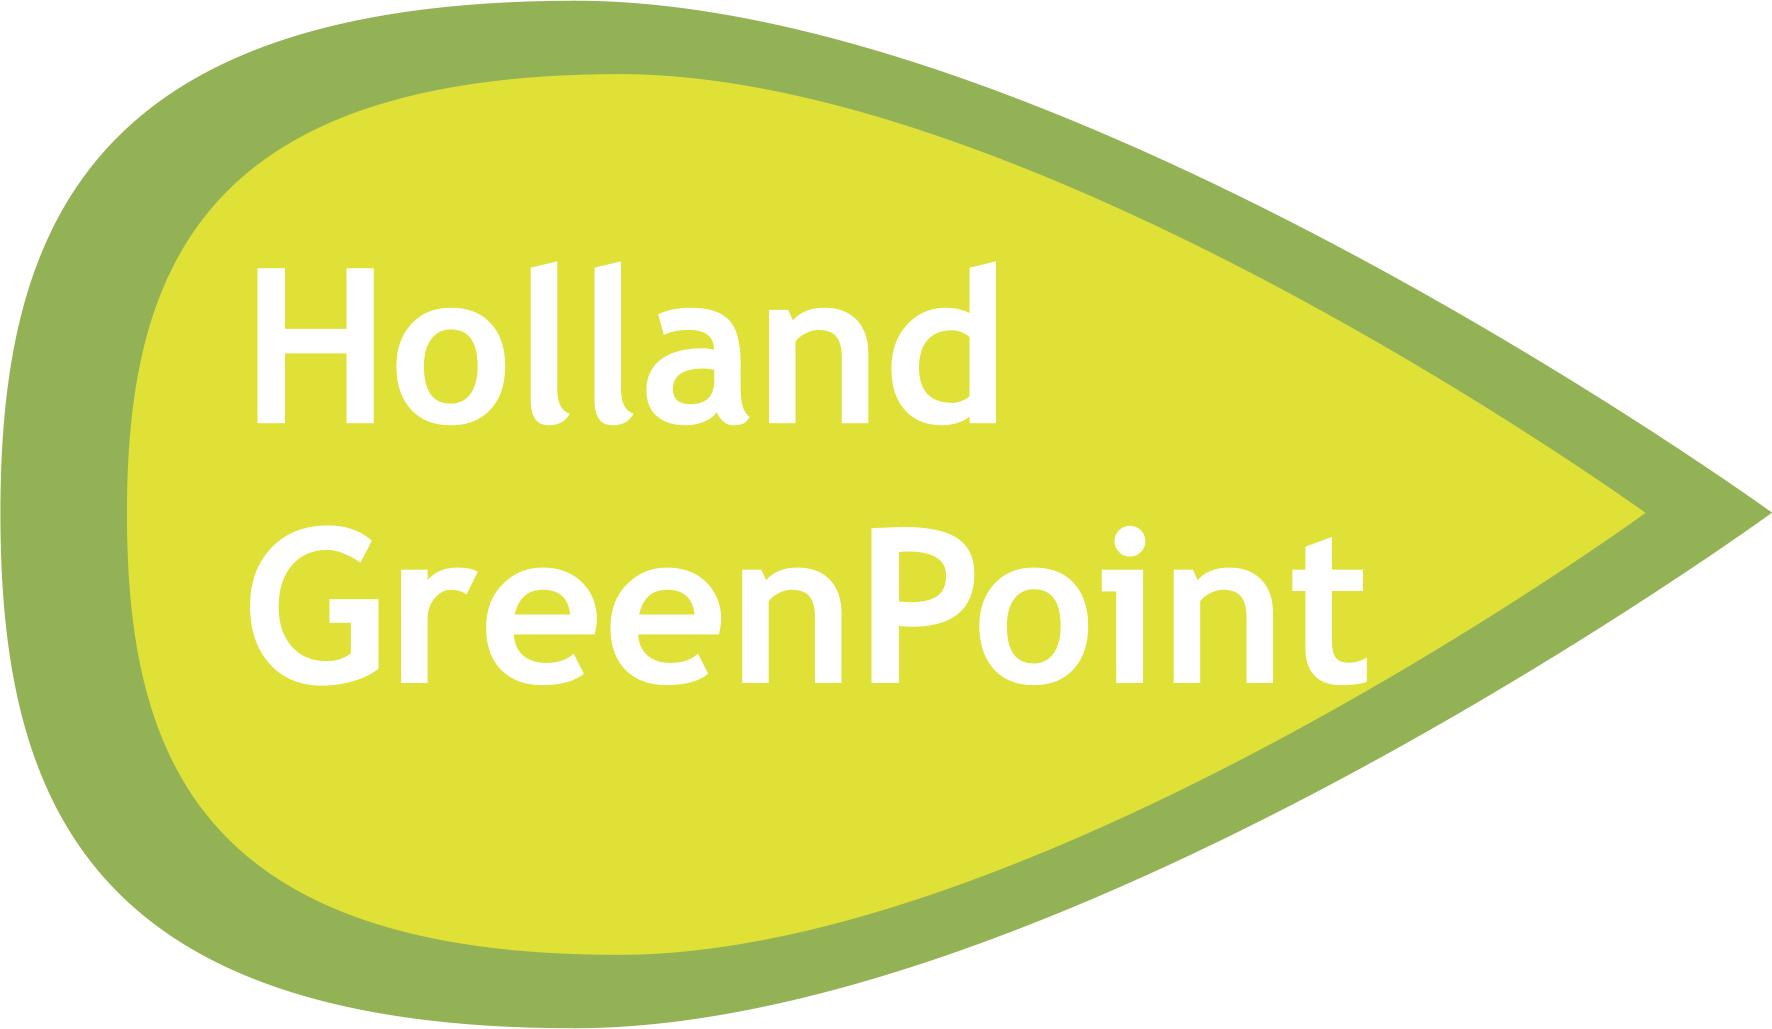 Holland GreenPoint - logo